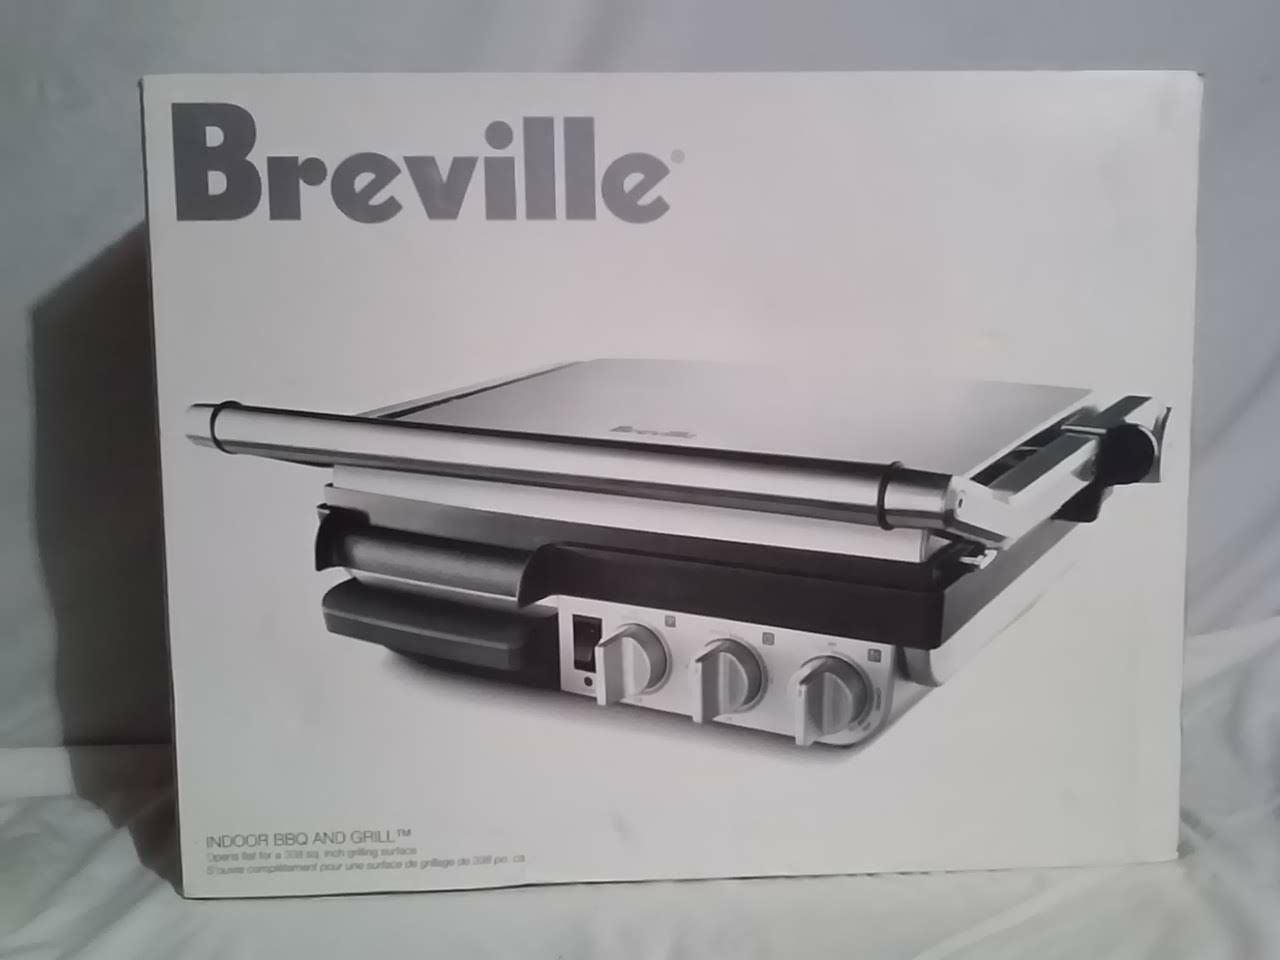 Breville grill